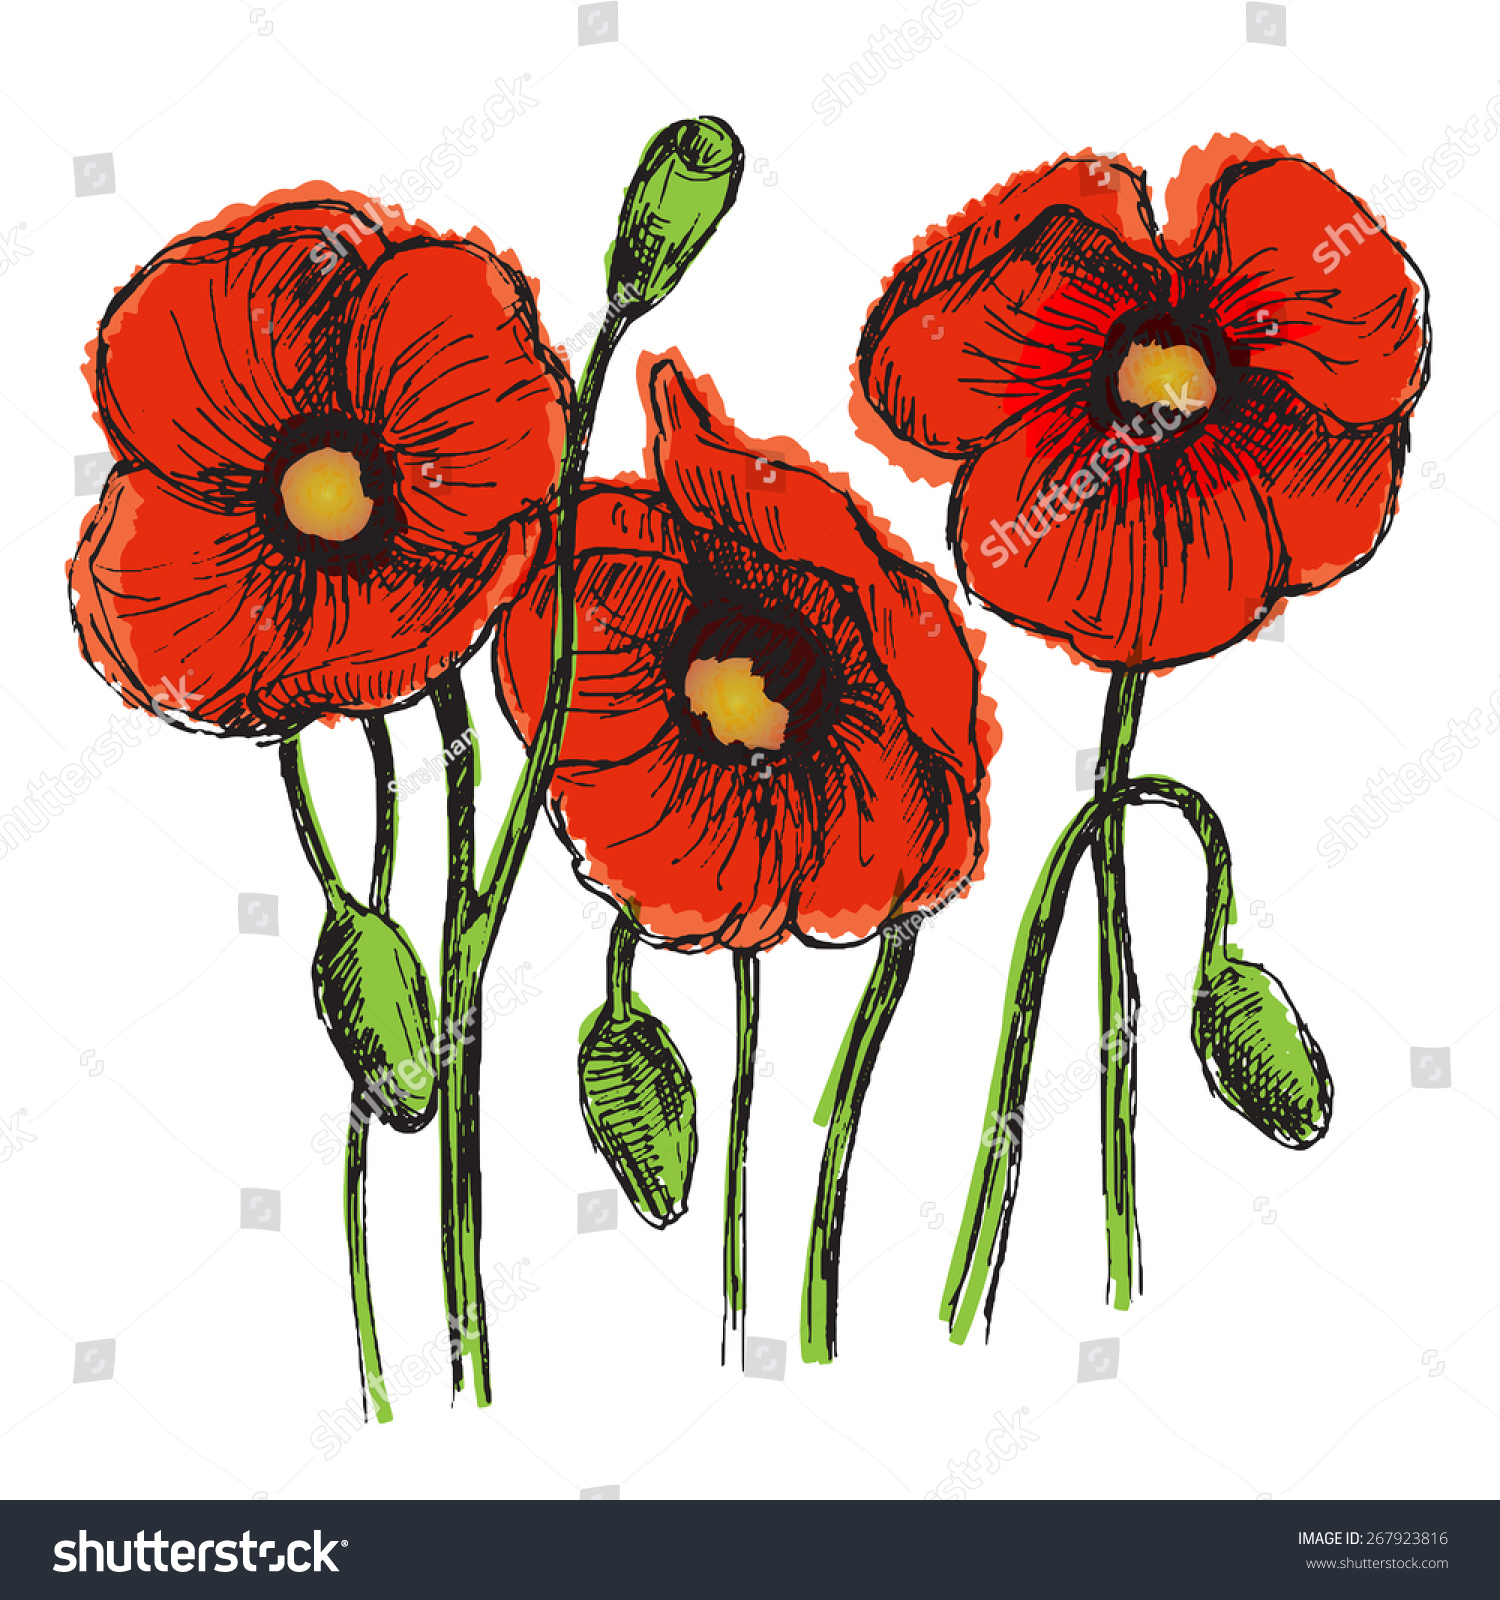 Flowers Set Color Sketch Converted Vectors Stock Vector 267923816 ...